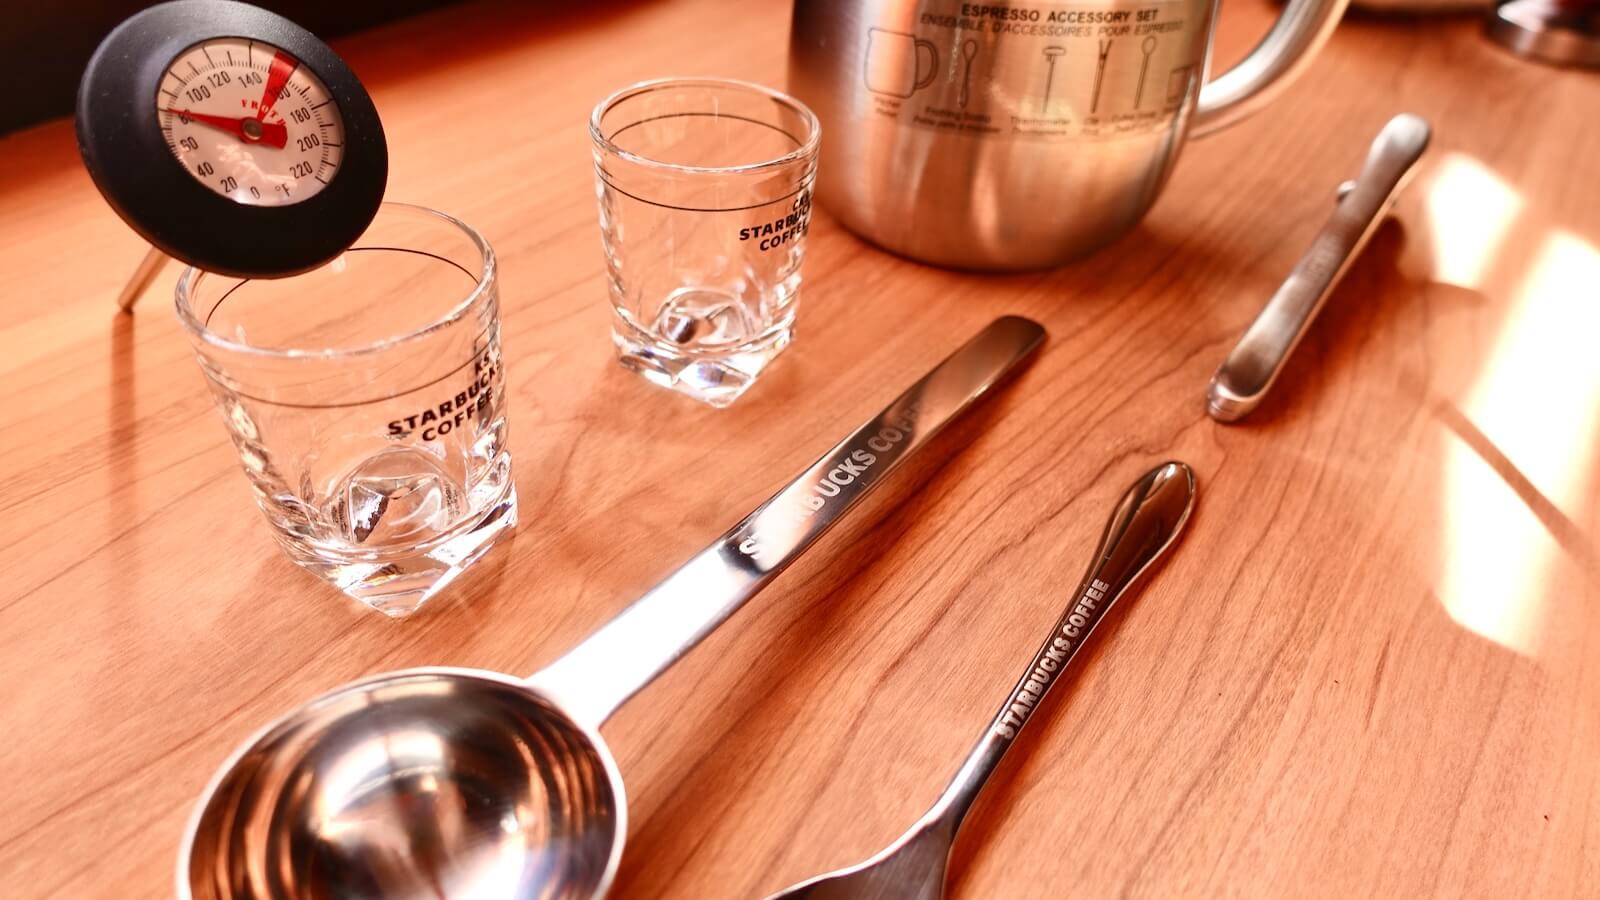 Not released in Japan Starbucks Espresso Kit 7 Set